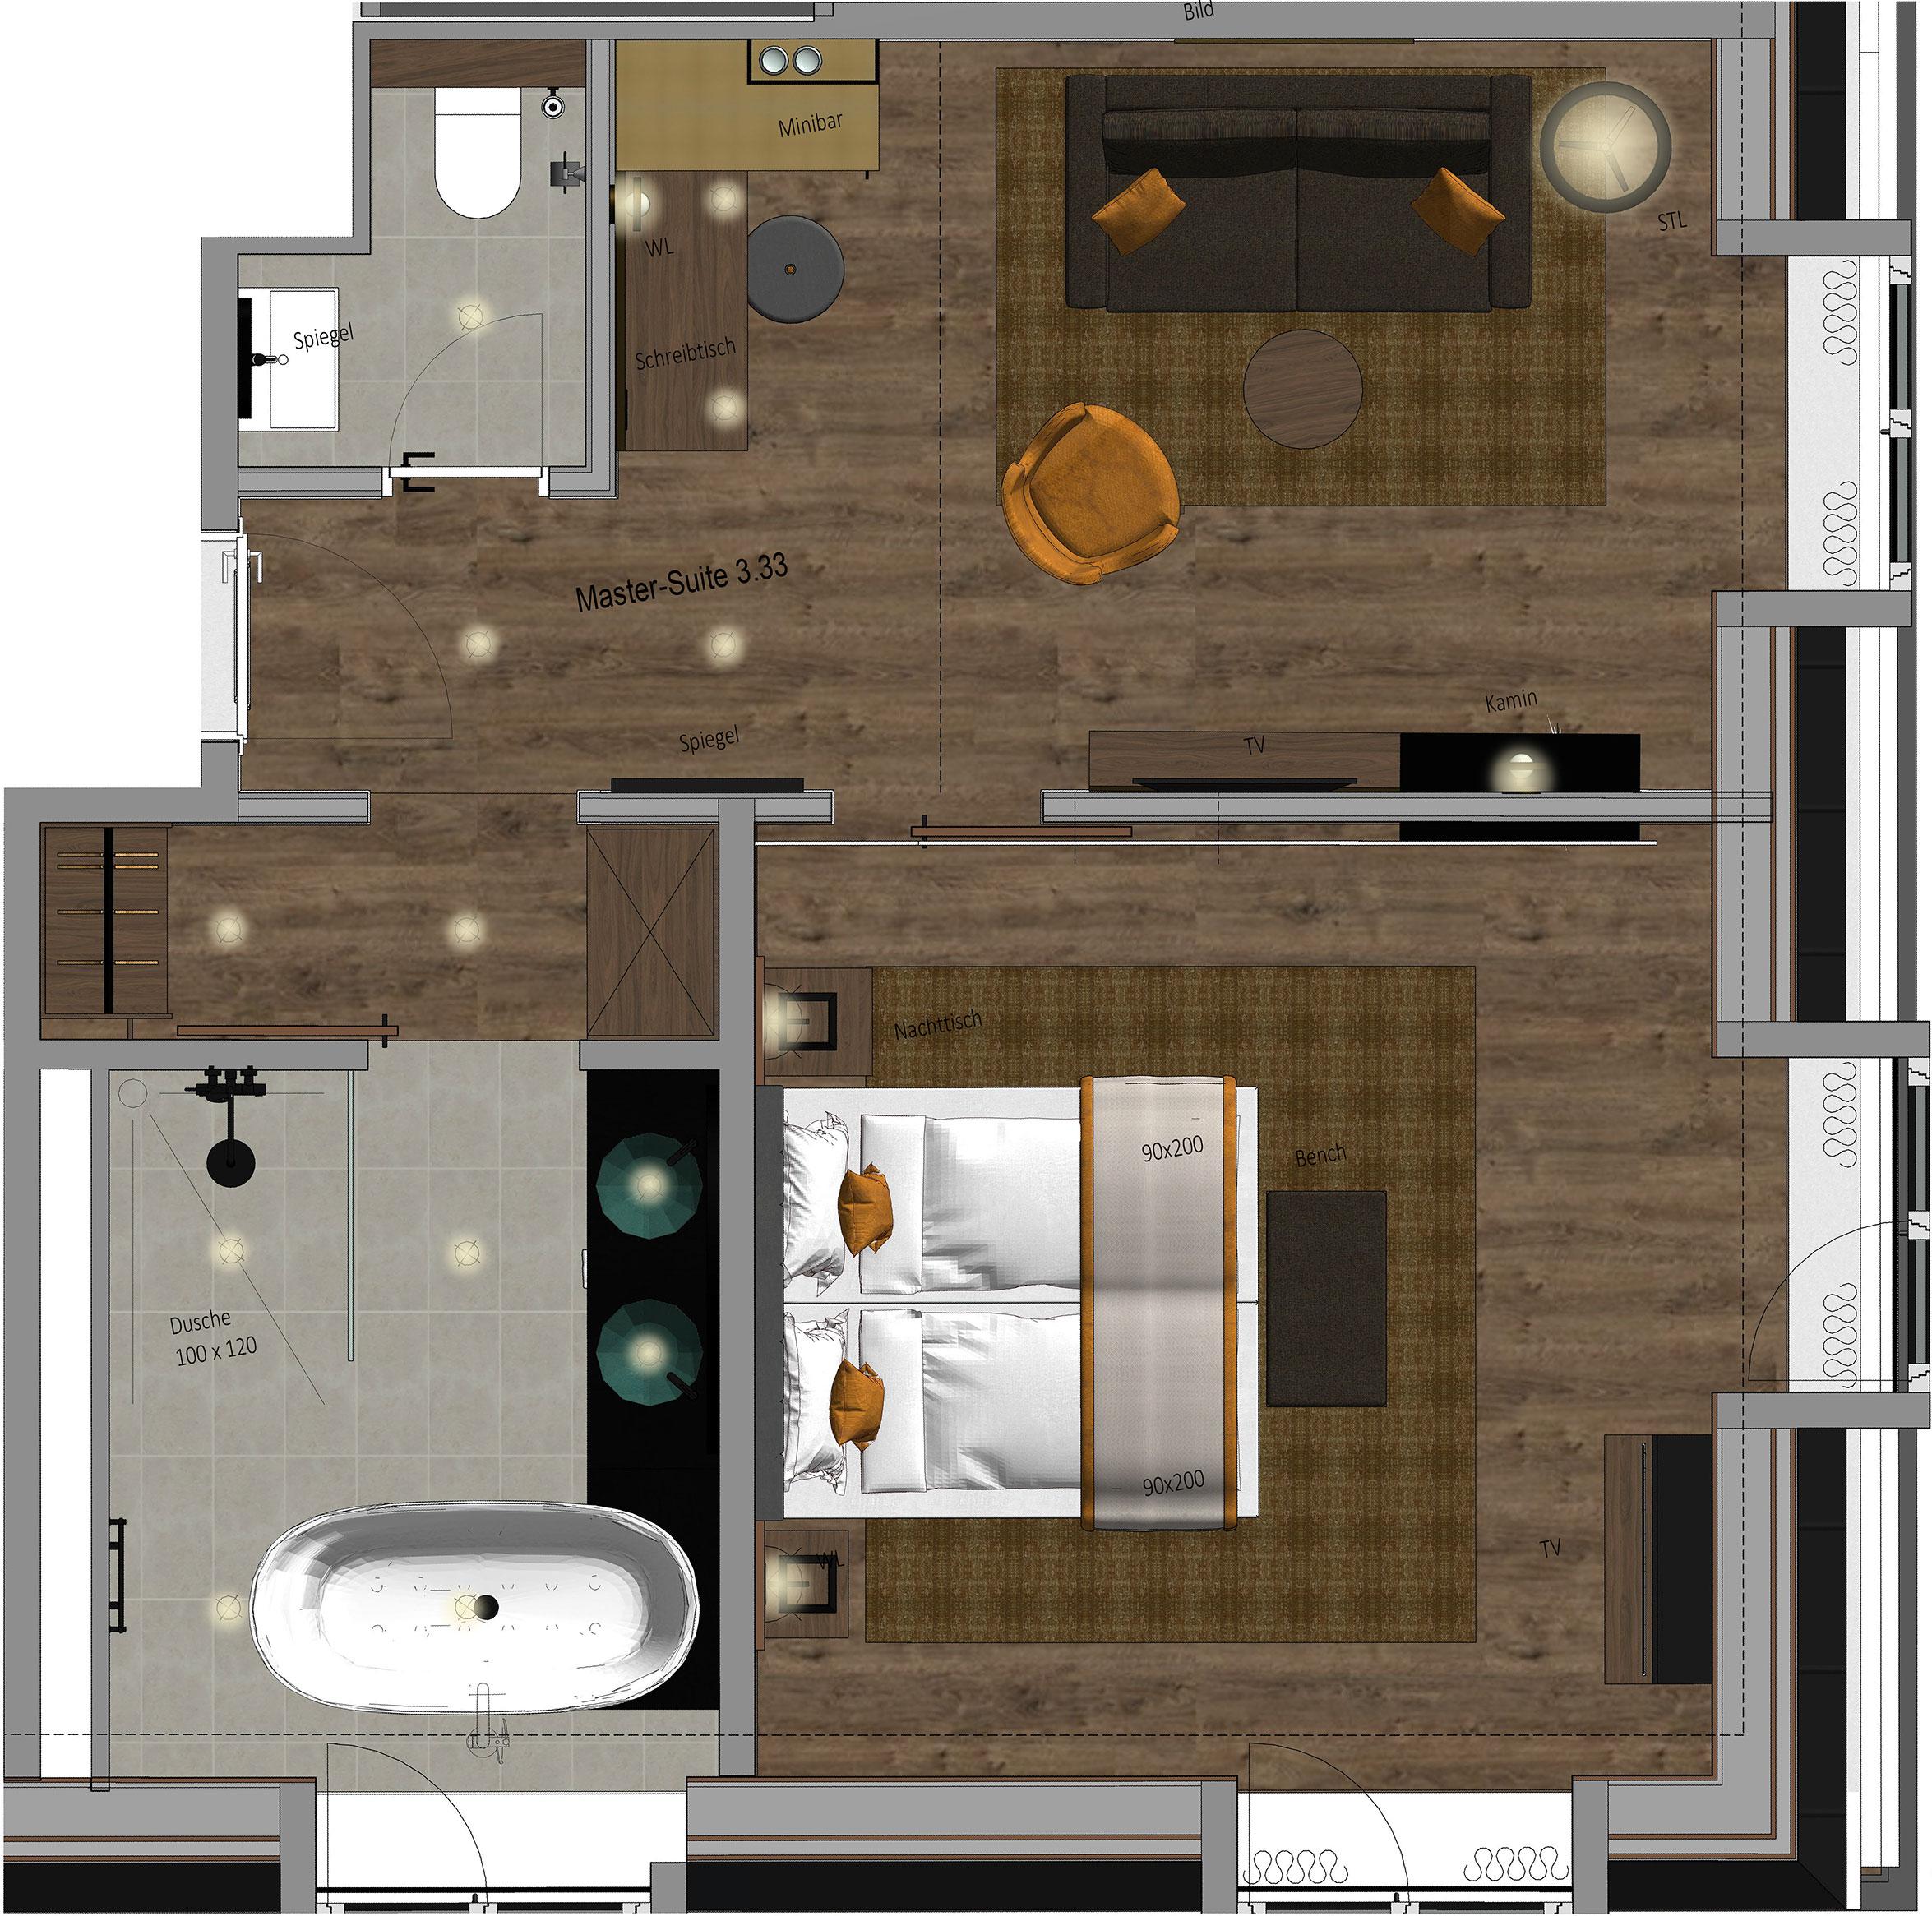 Karls Hotel Master Suite Floor Plan